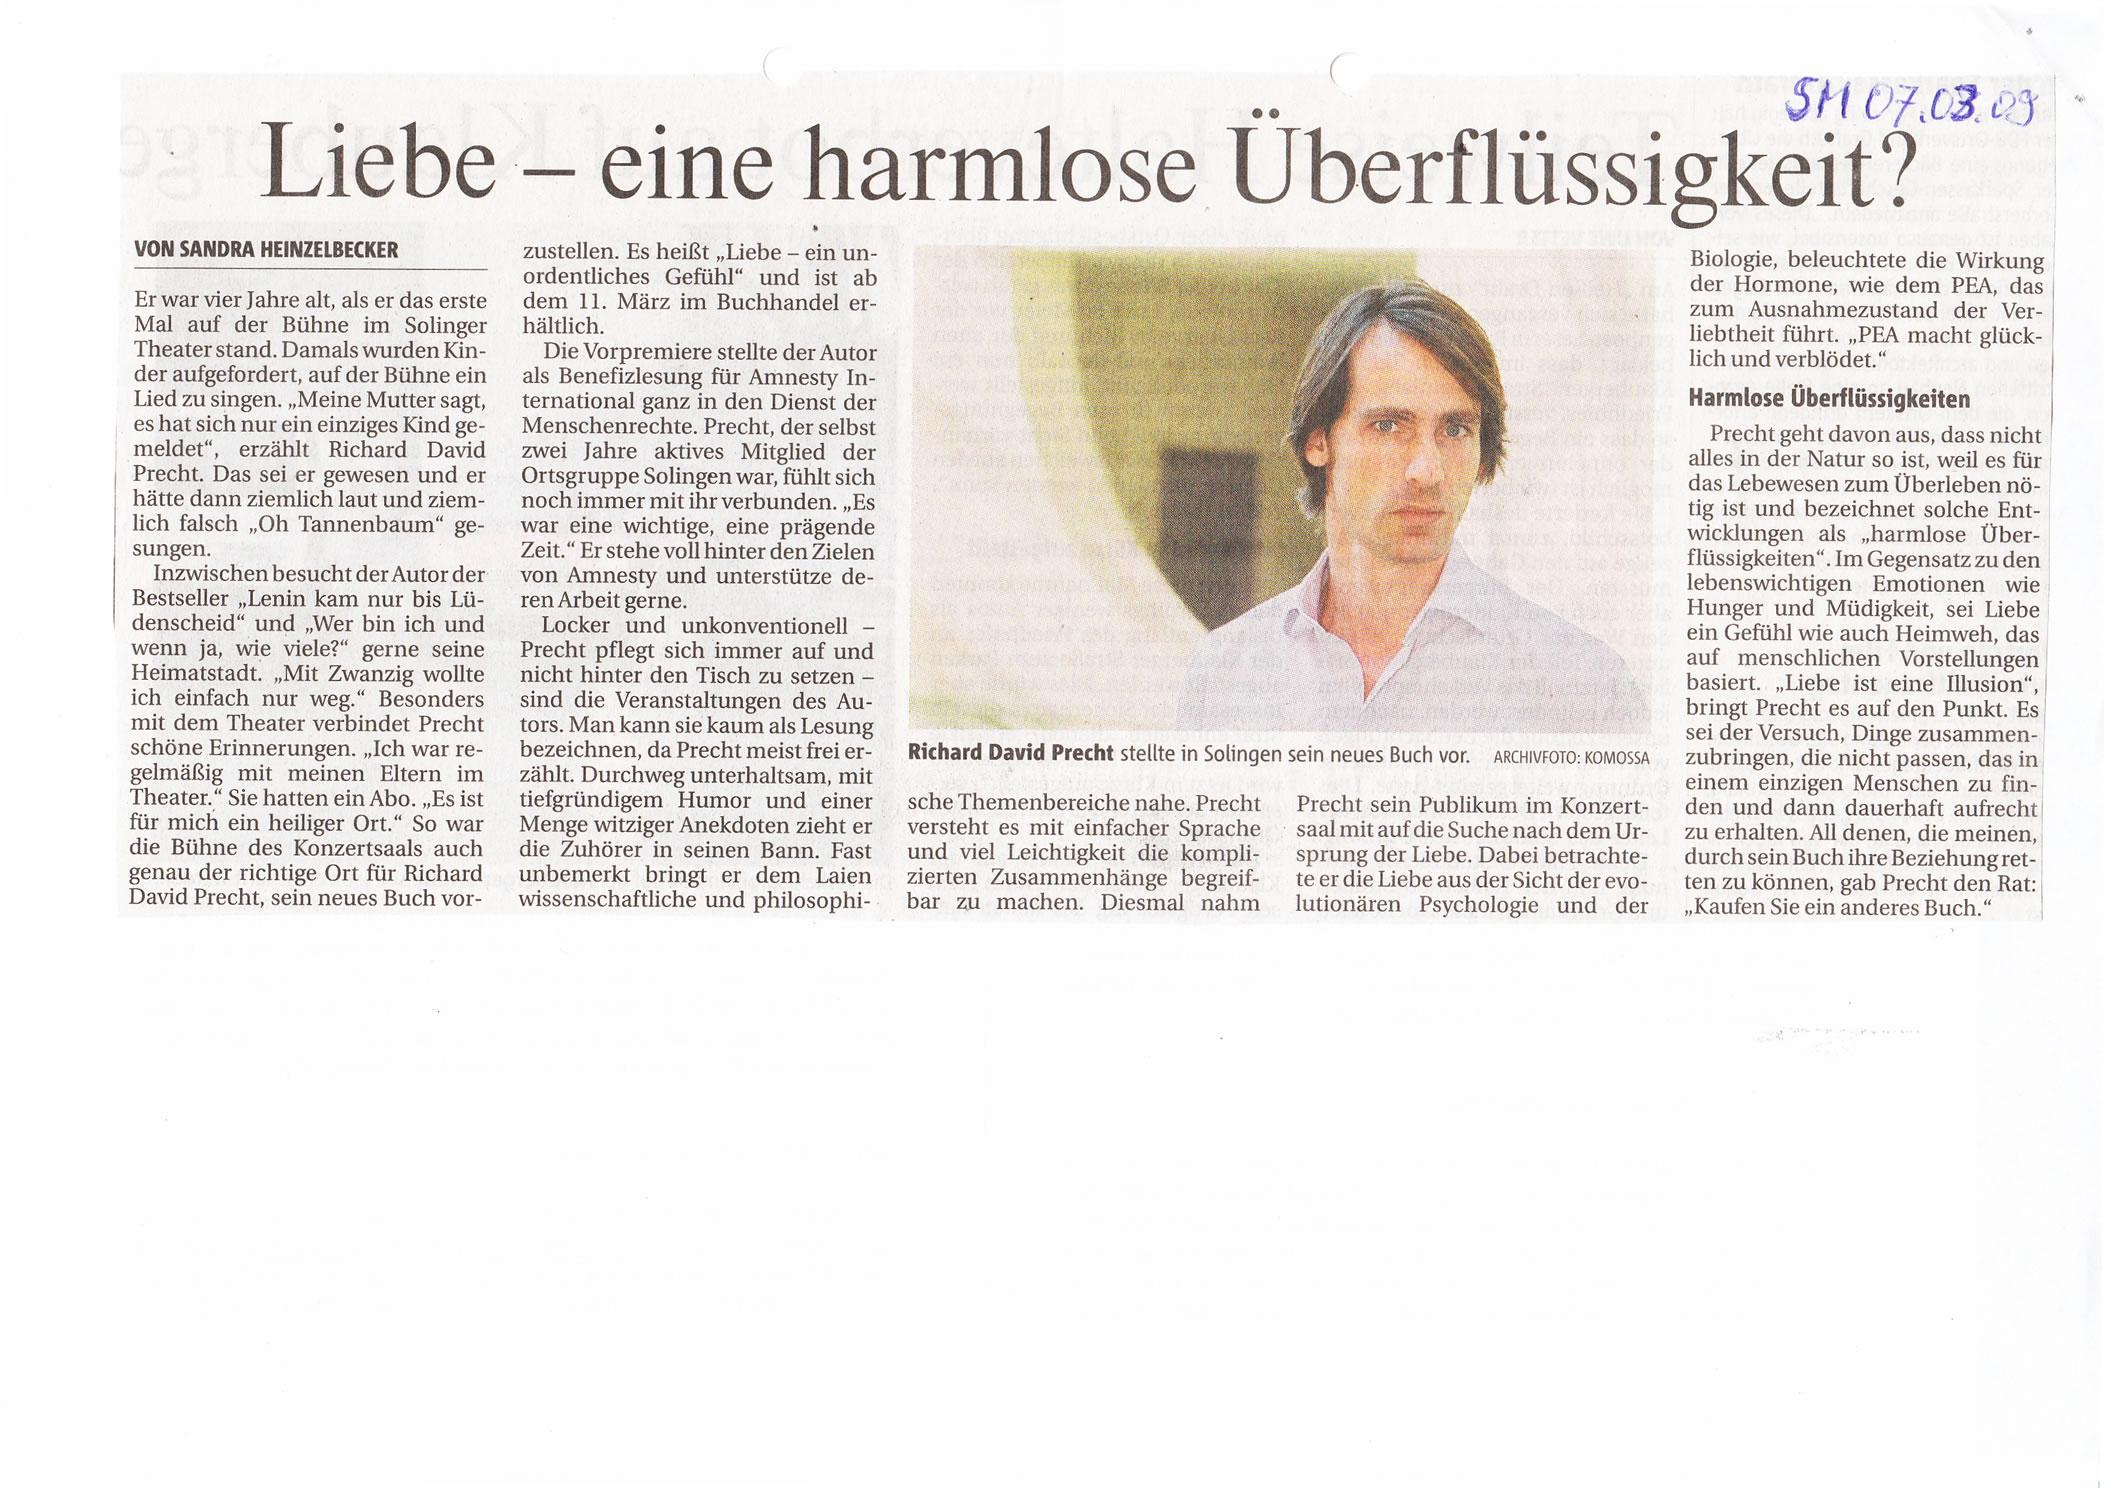 Solinger Morgenpost 03/09: Bericht Lesung Richard David Precht